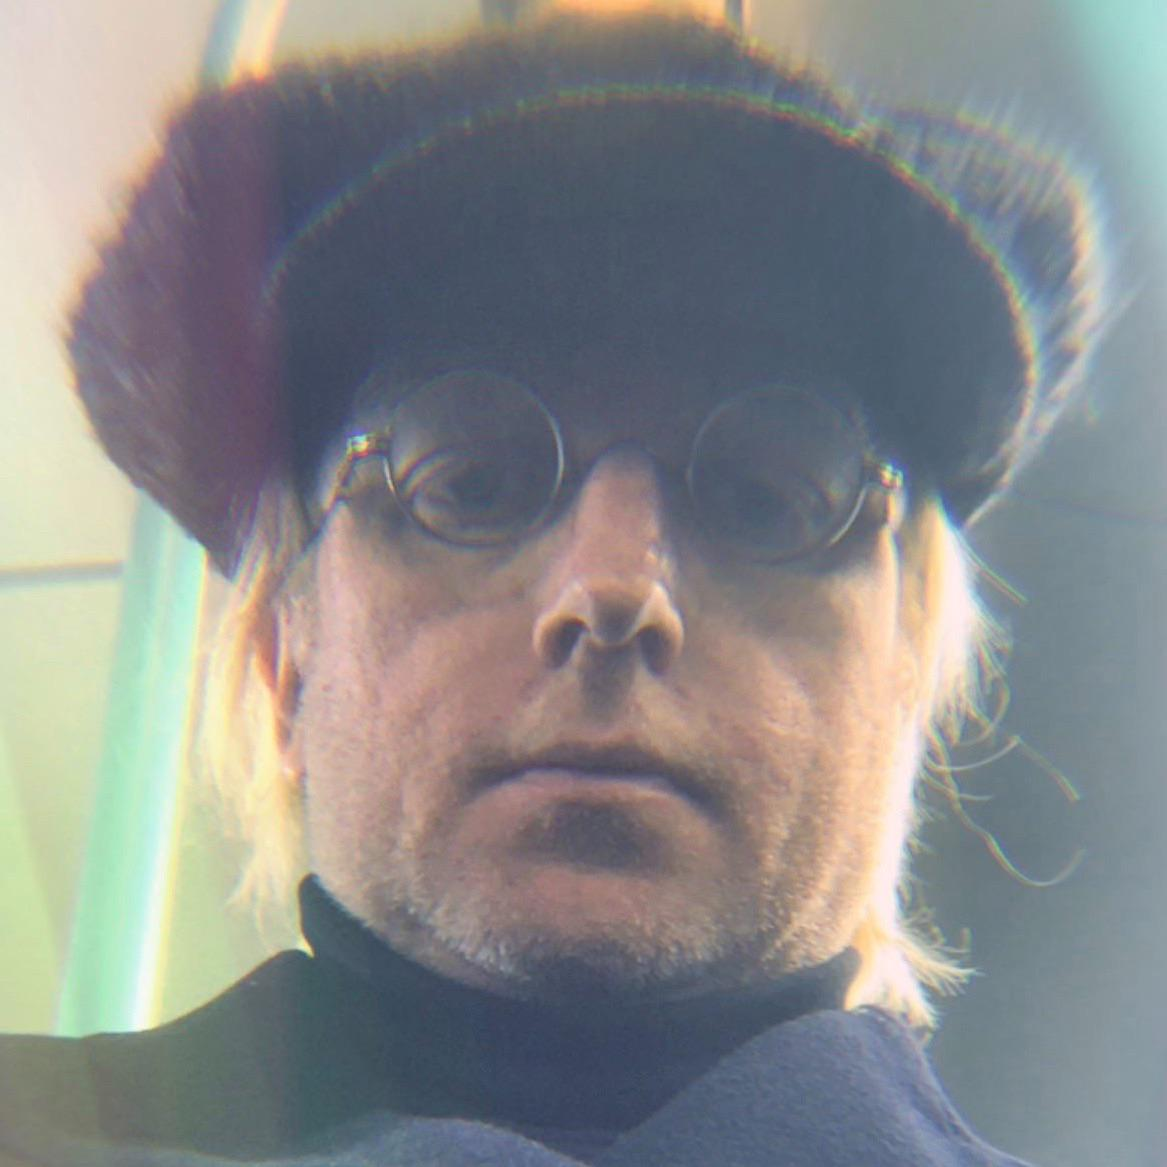 Testing photo uploads - my most recent selfie.